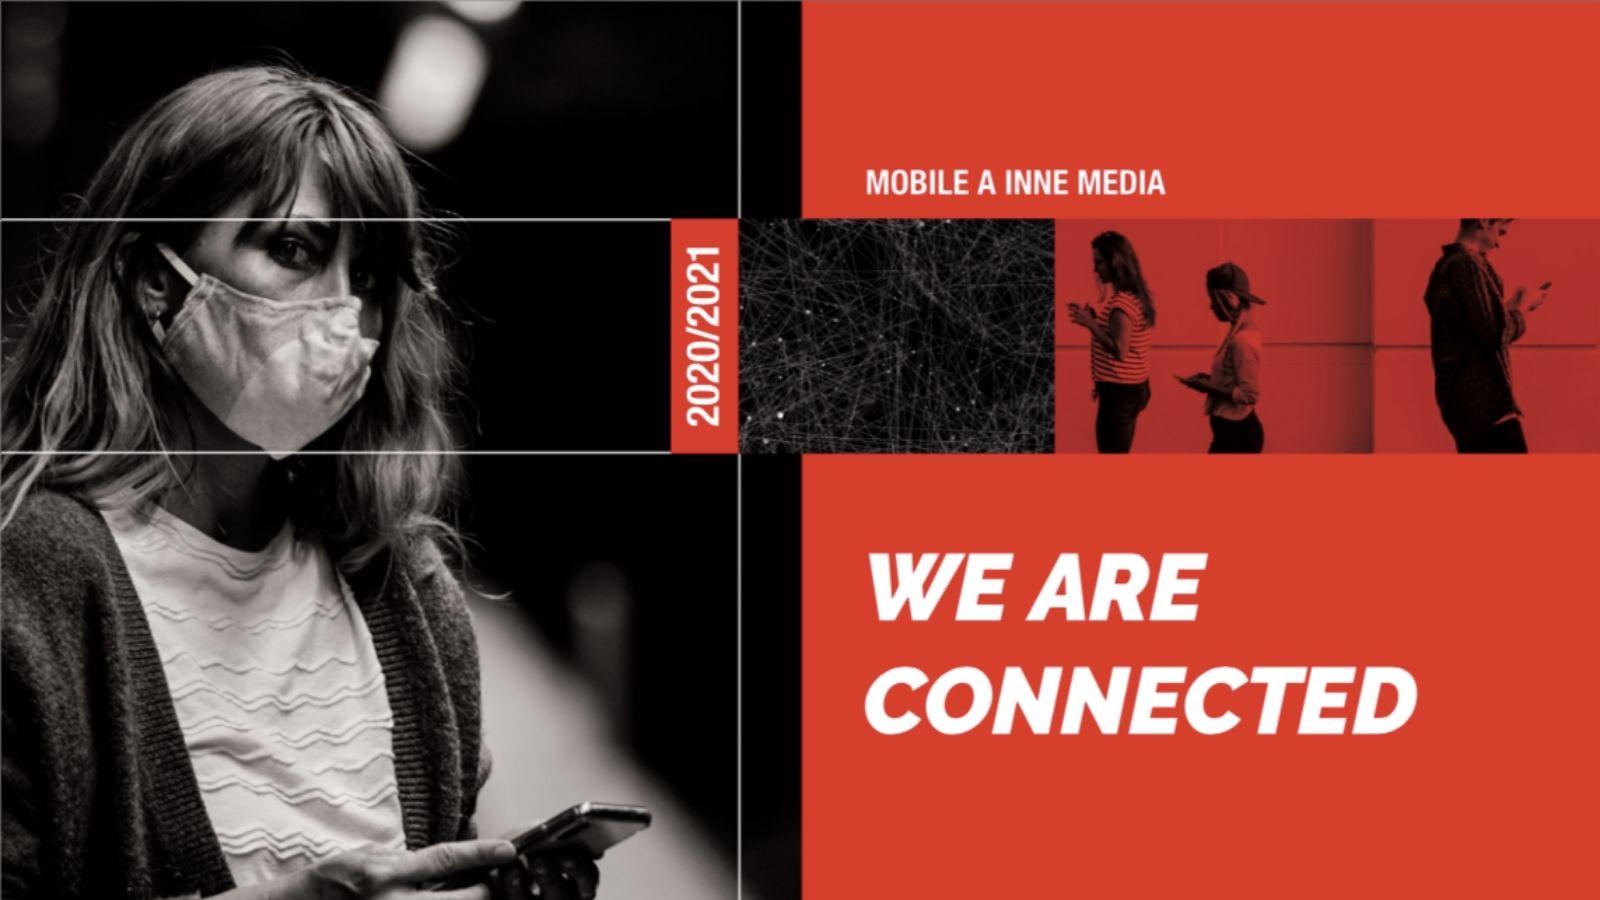 Jak wygląda rynek mobile? [RAPORT] Spicy Mobile mediarun spicy mobile